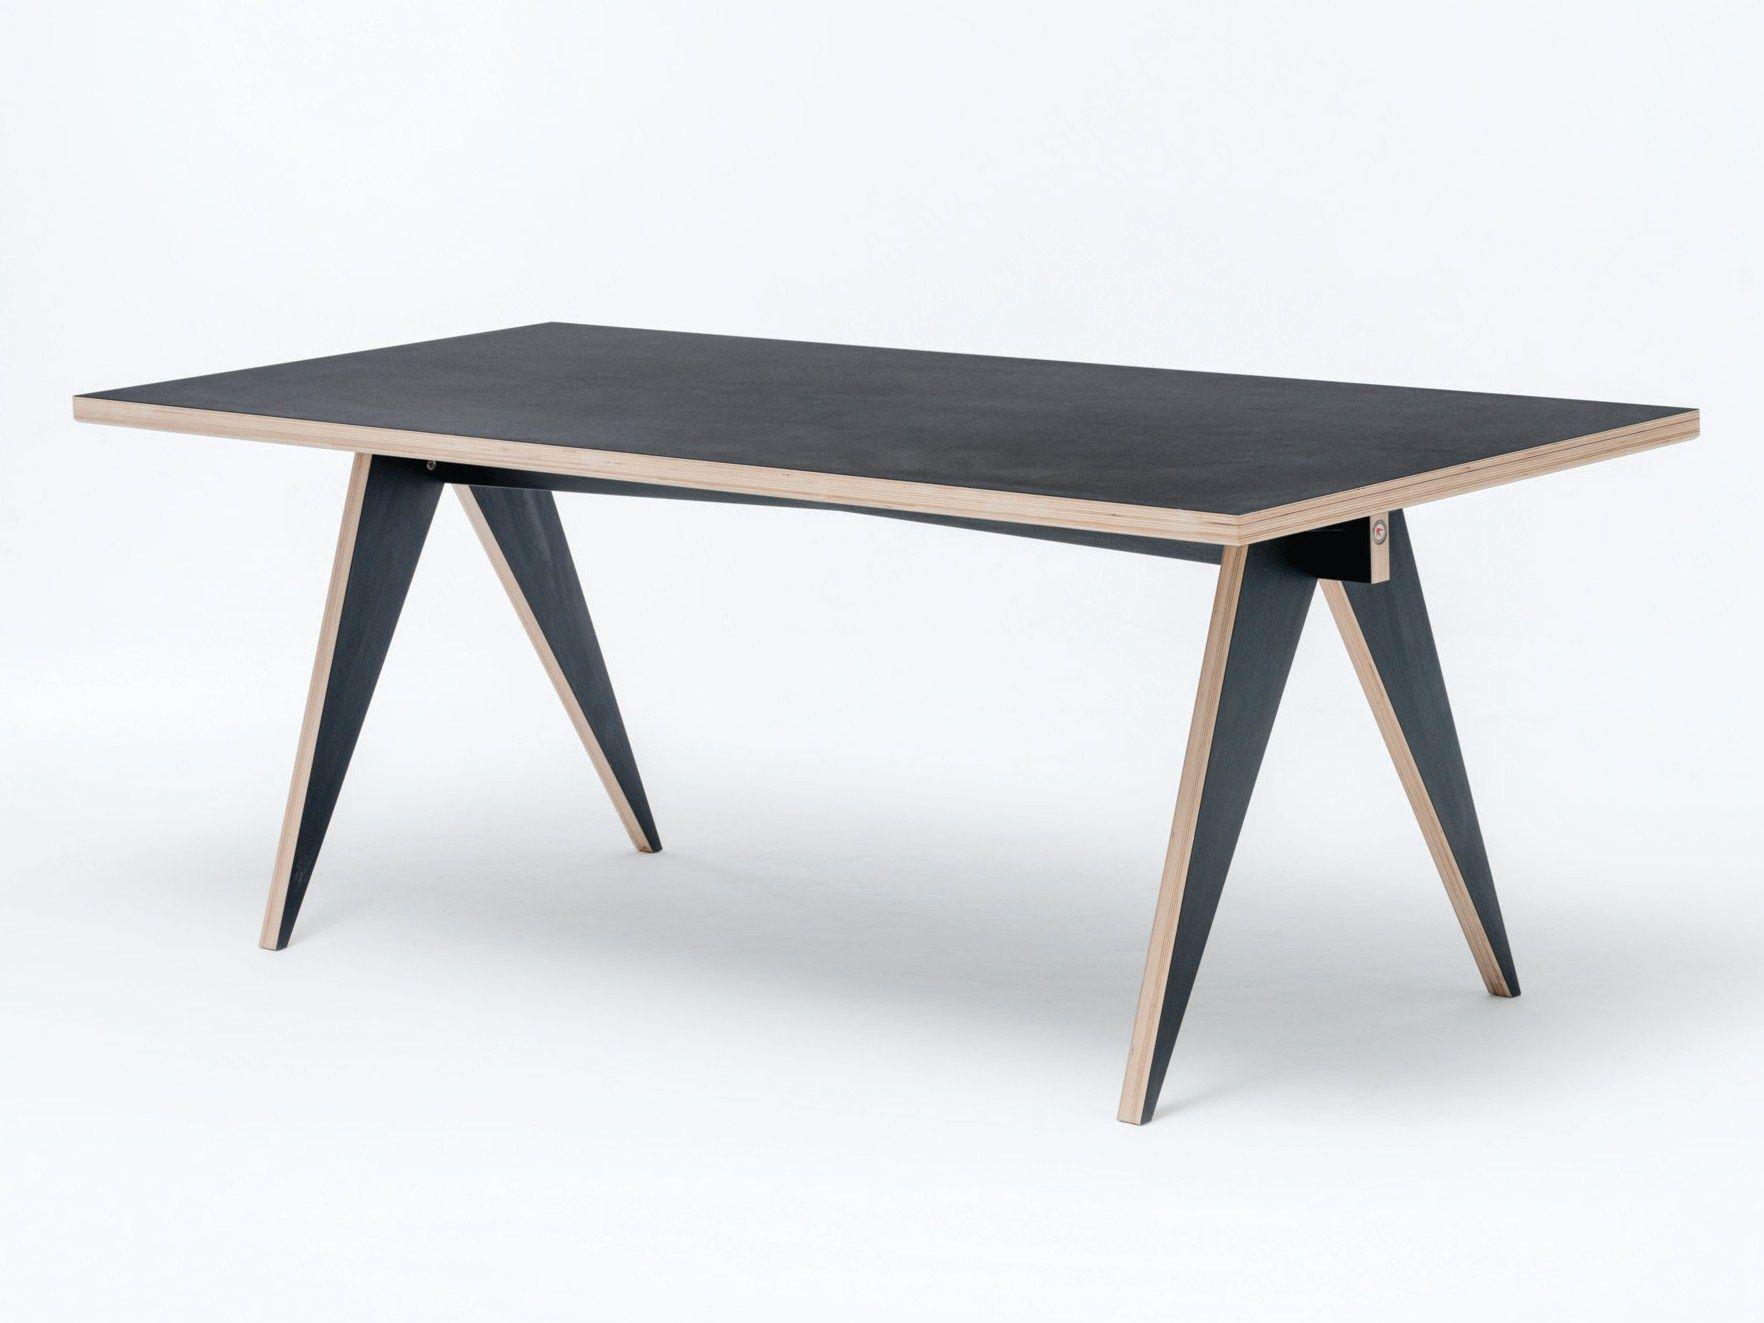 0d1d570b5a89c7c9d14ea8191df1598a Luxe De Table Tres Basse Conception